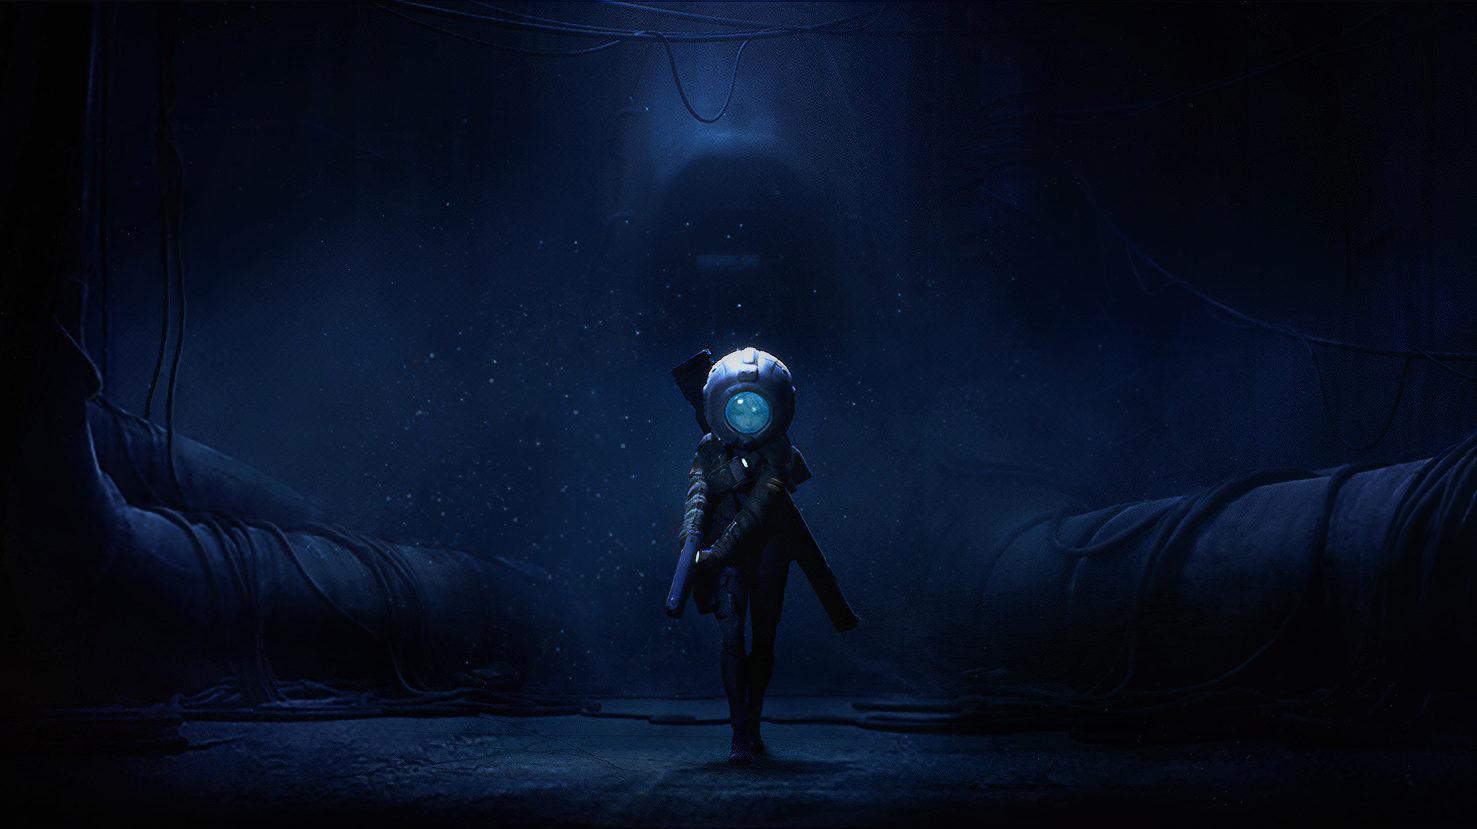 Section 9 Interactive Scifi-Adventure